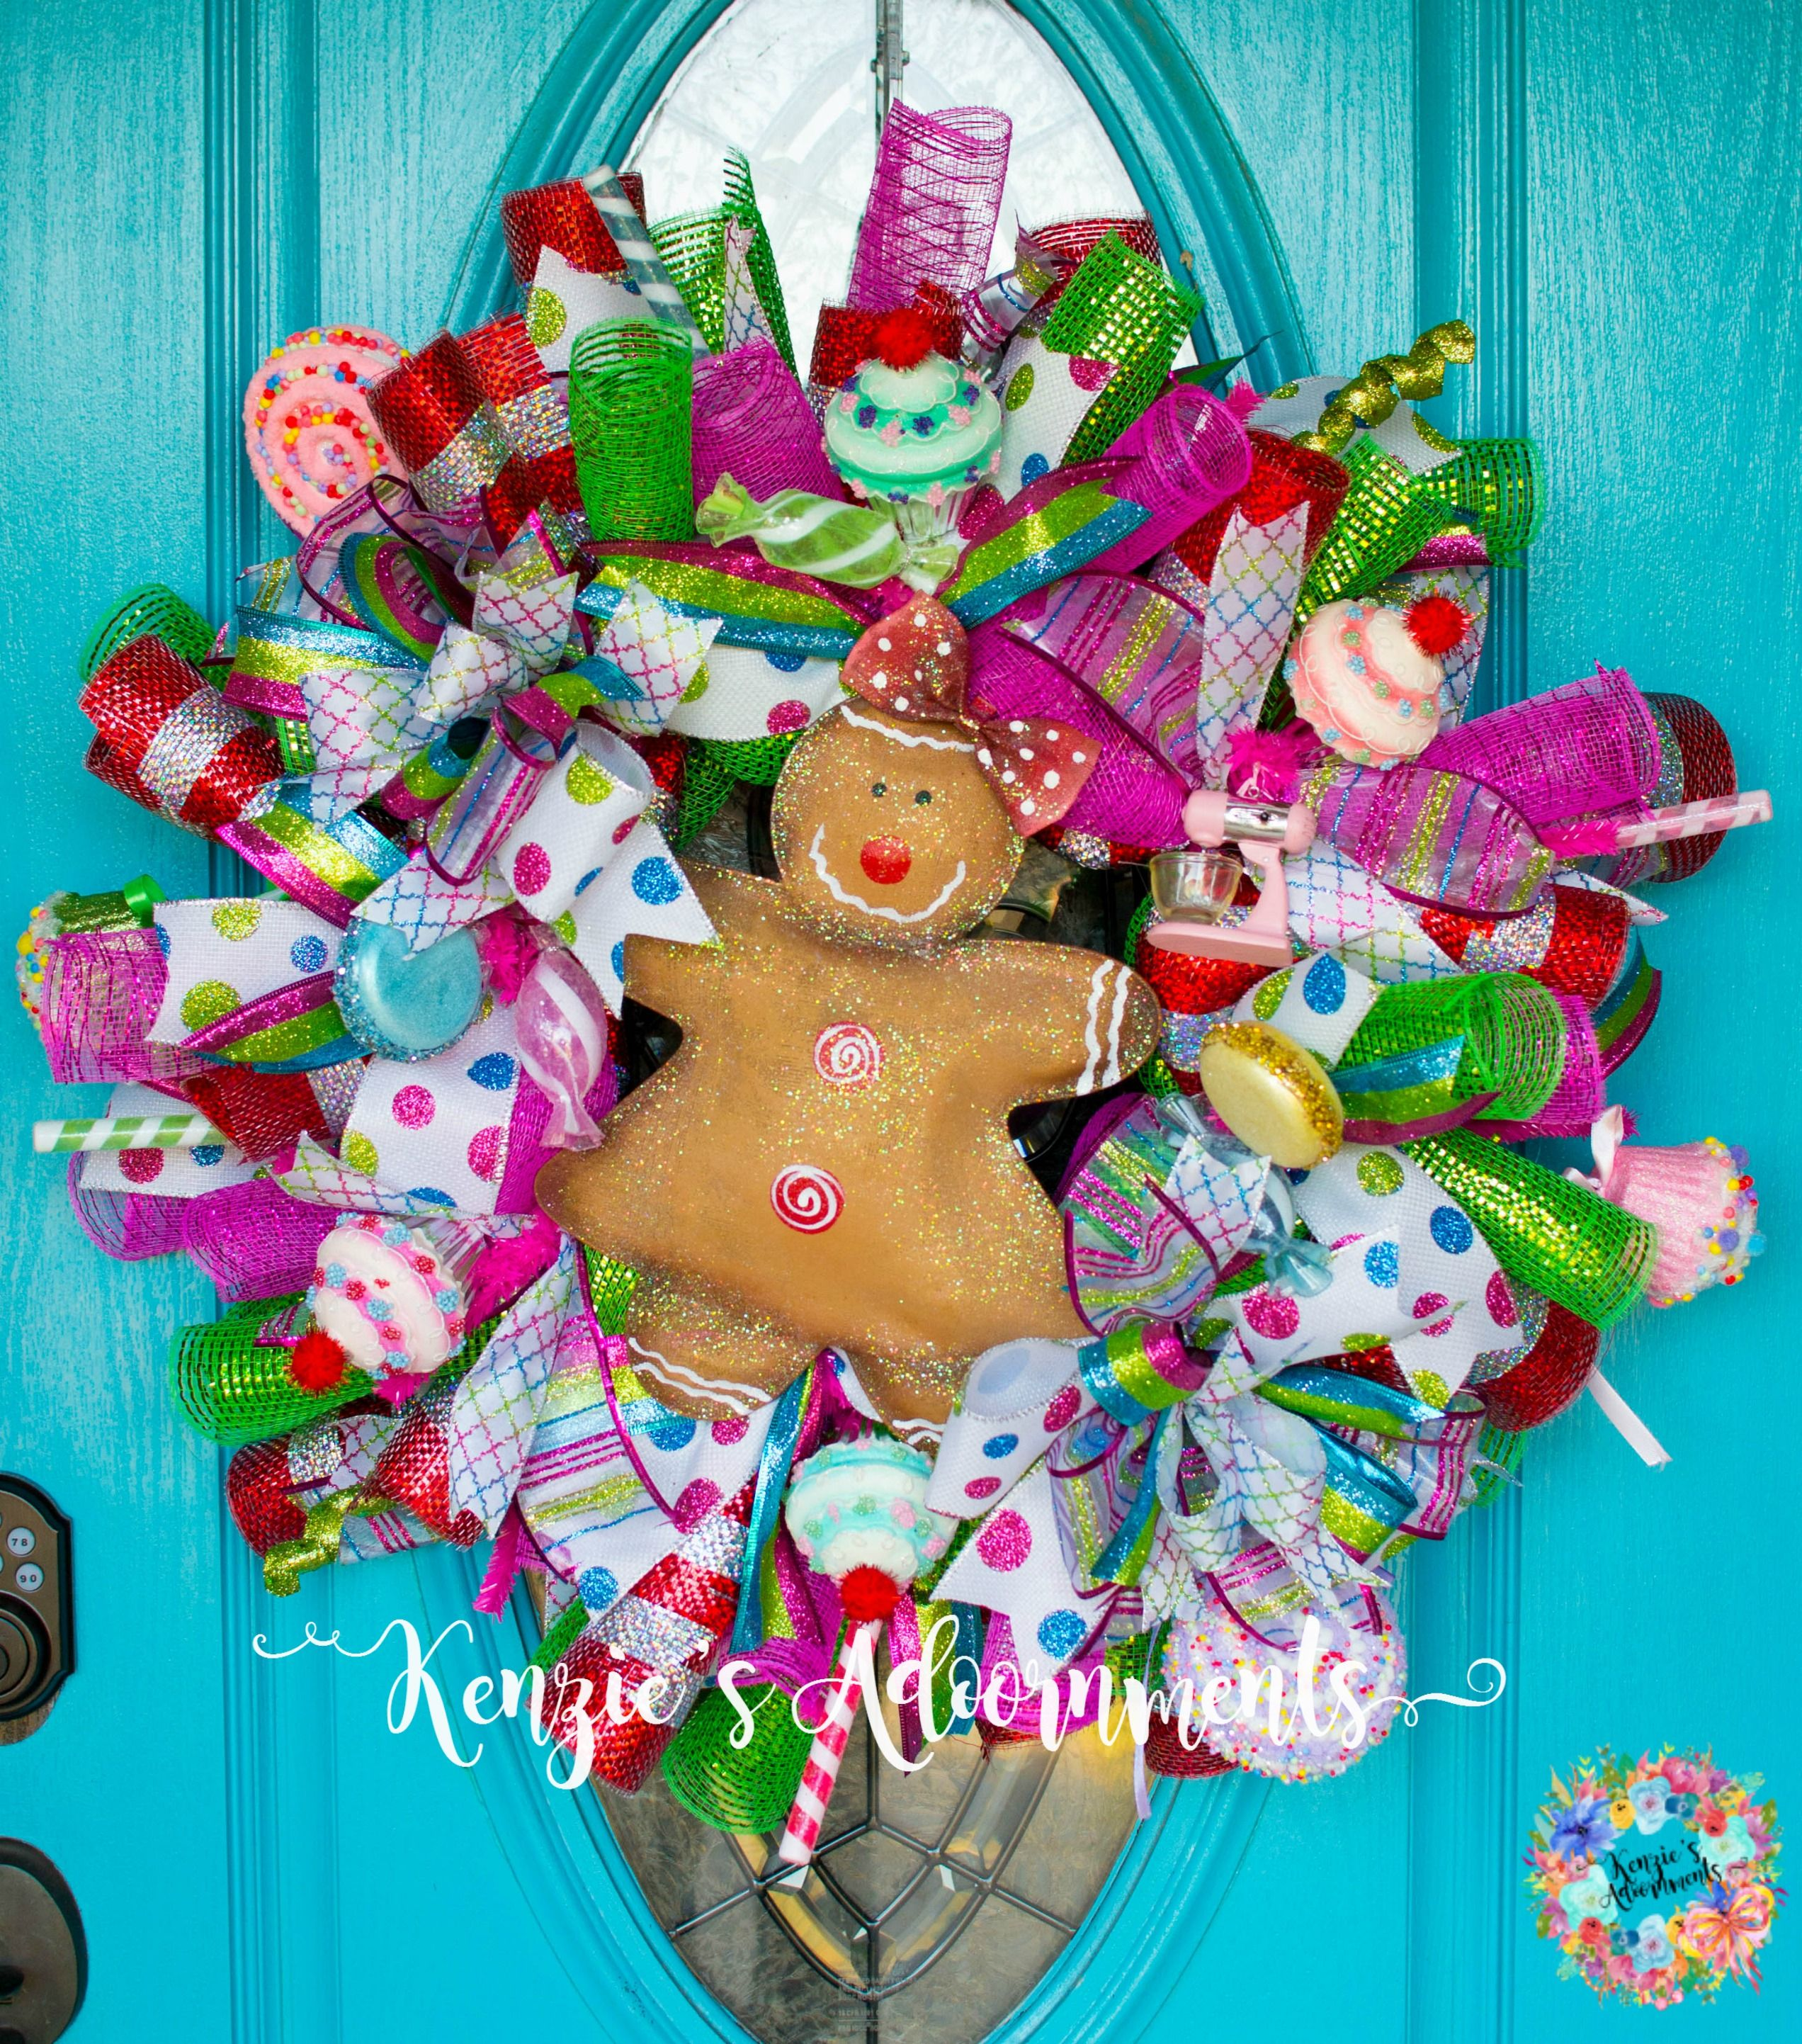 Gingerbread Wreath made by KenziesAdoornments